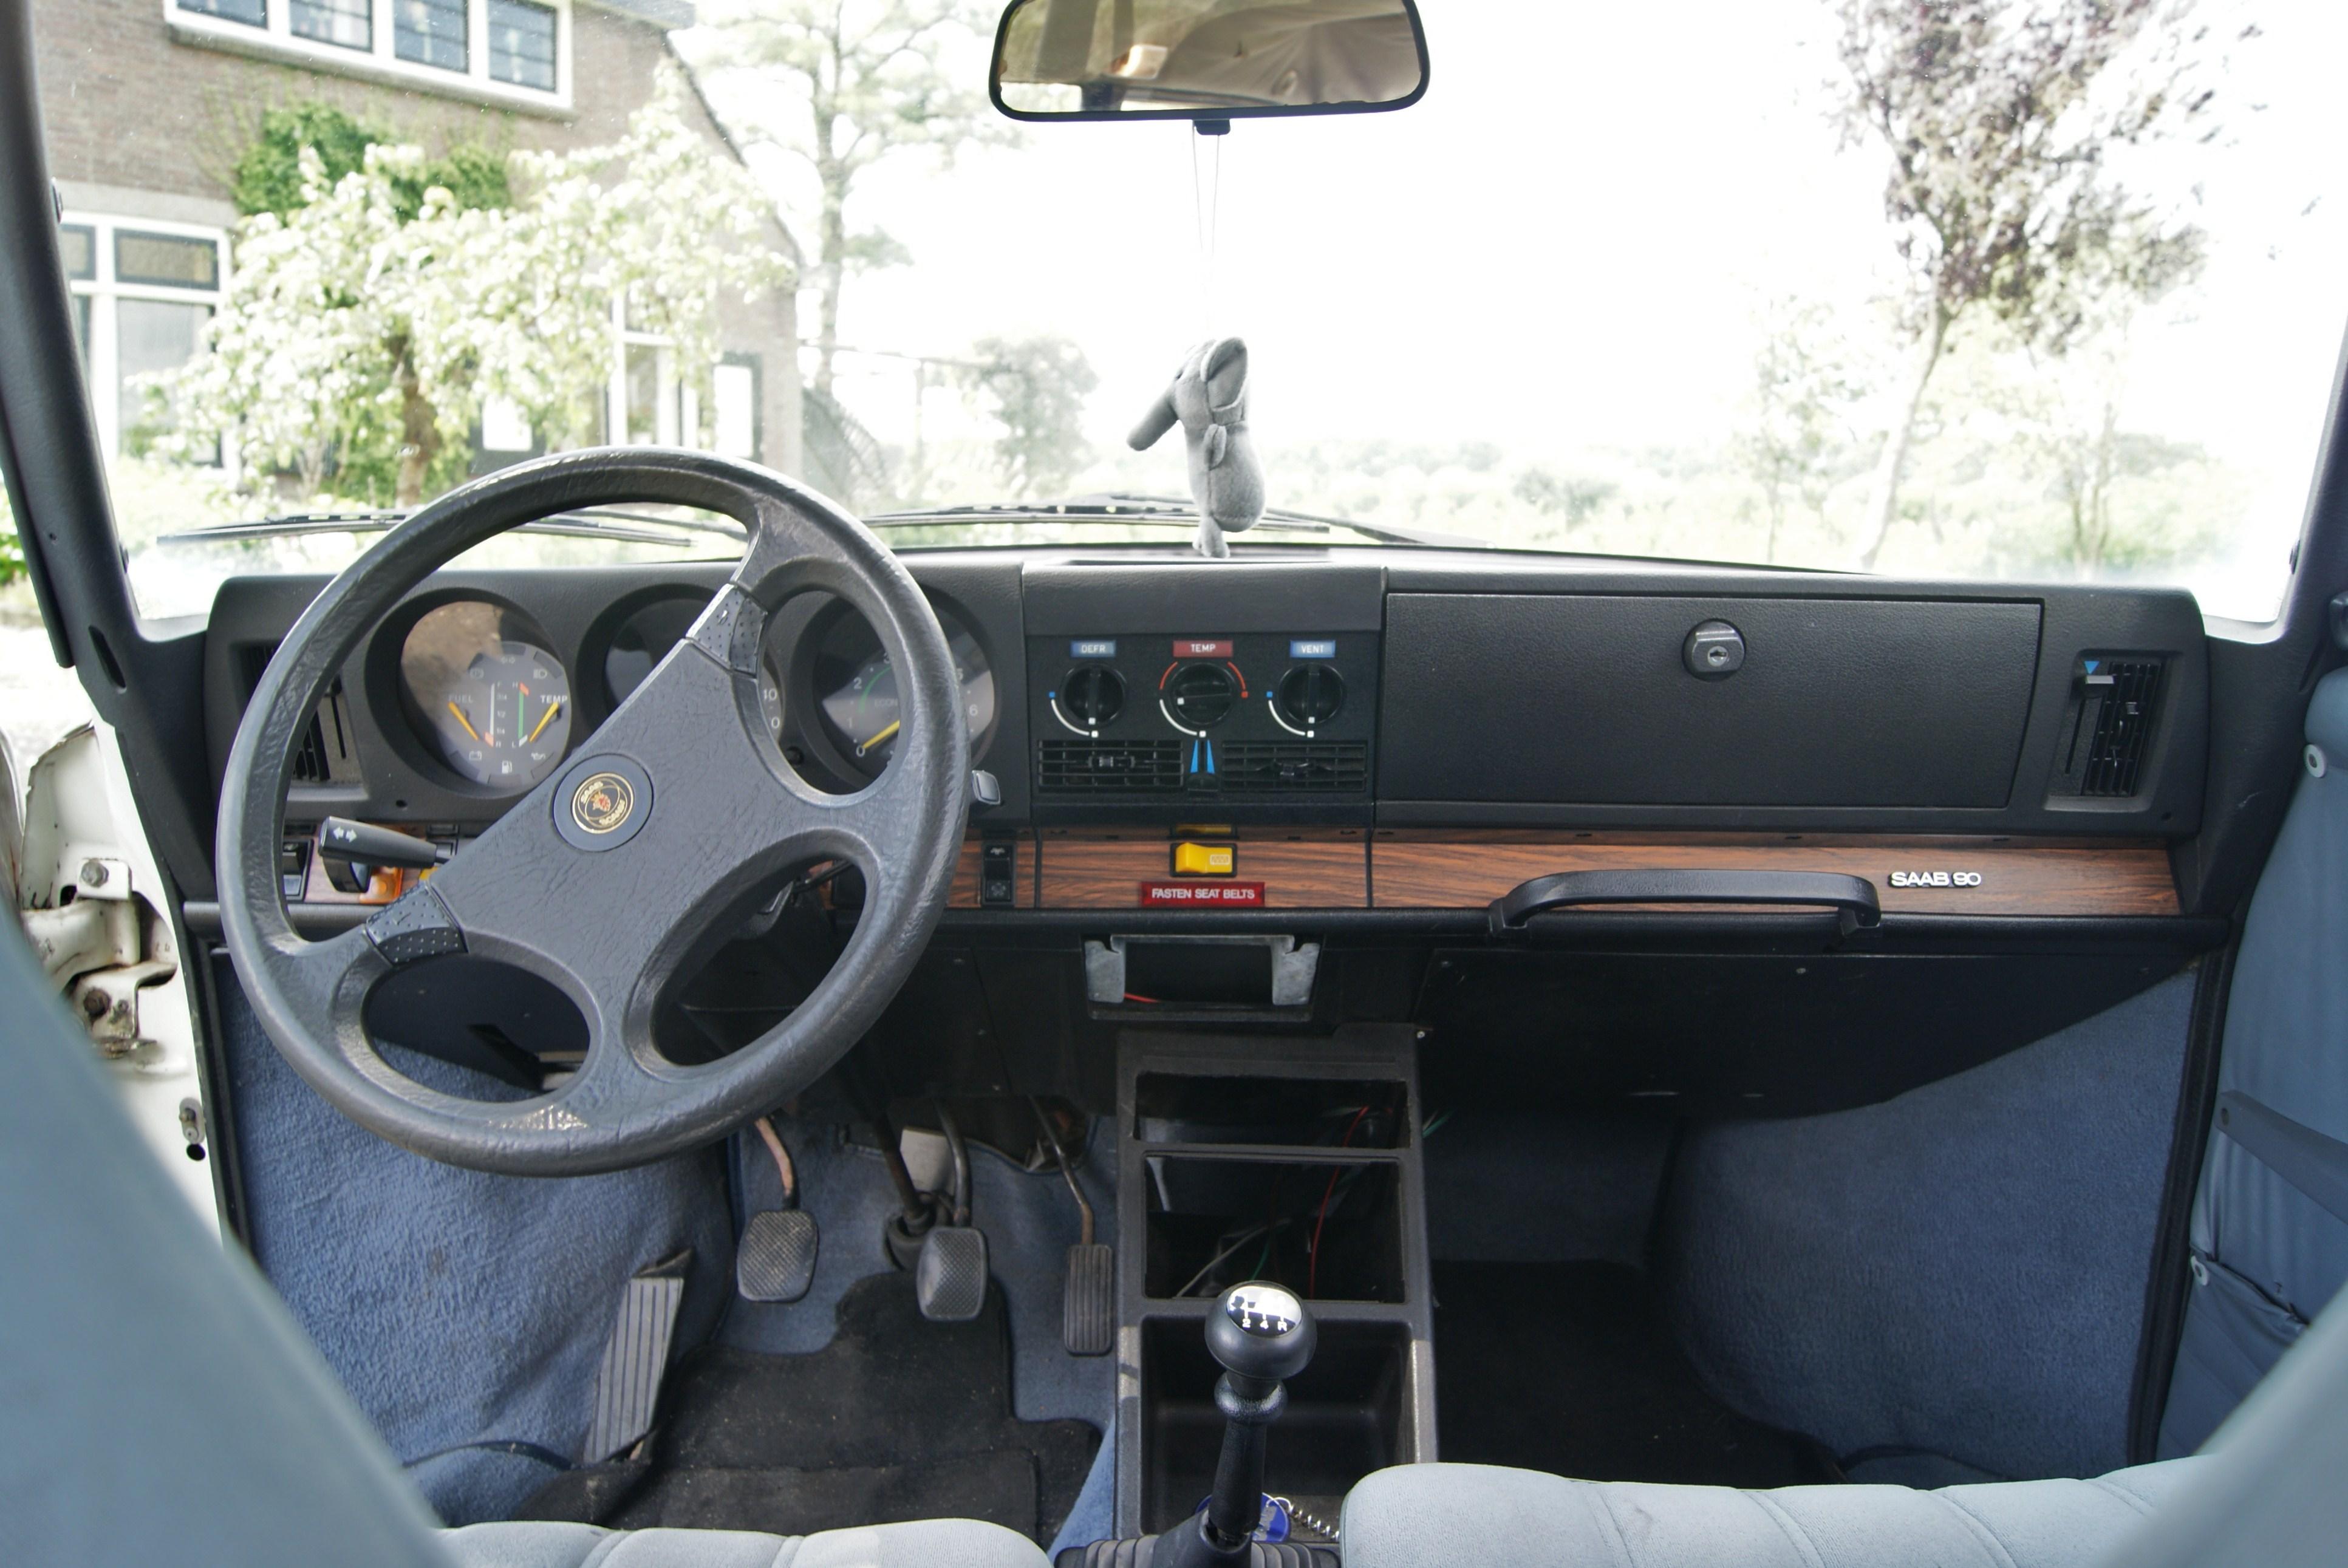 File:1986 Saab 90 - interior (10555407344).jpg - Wikimedia Commons